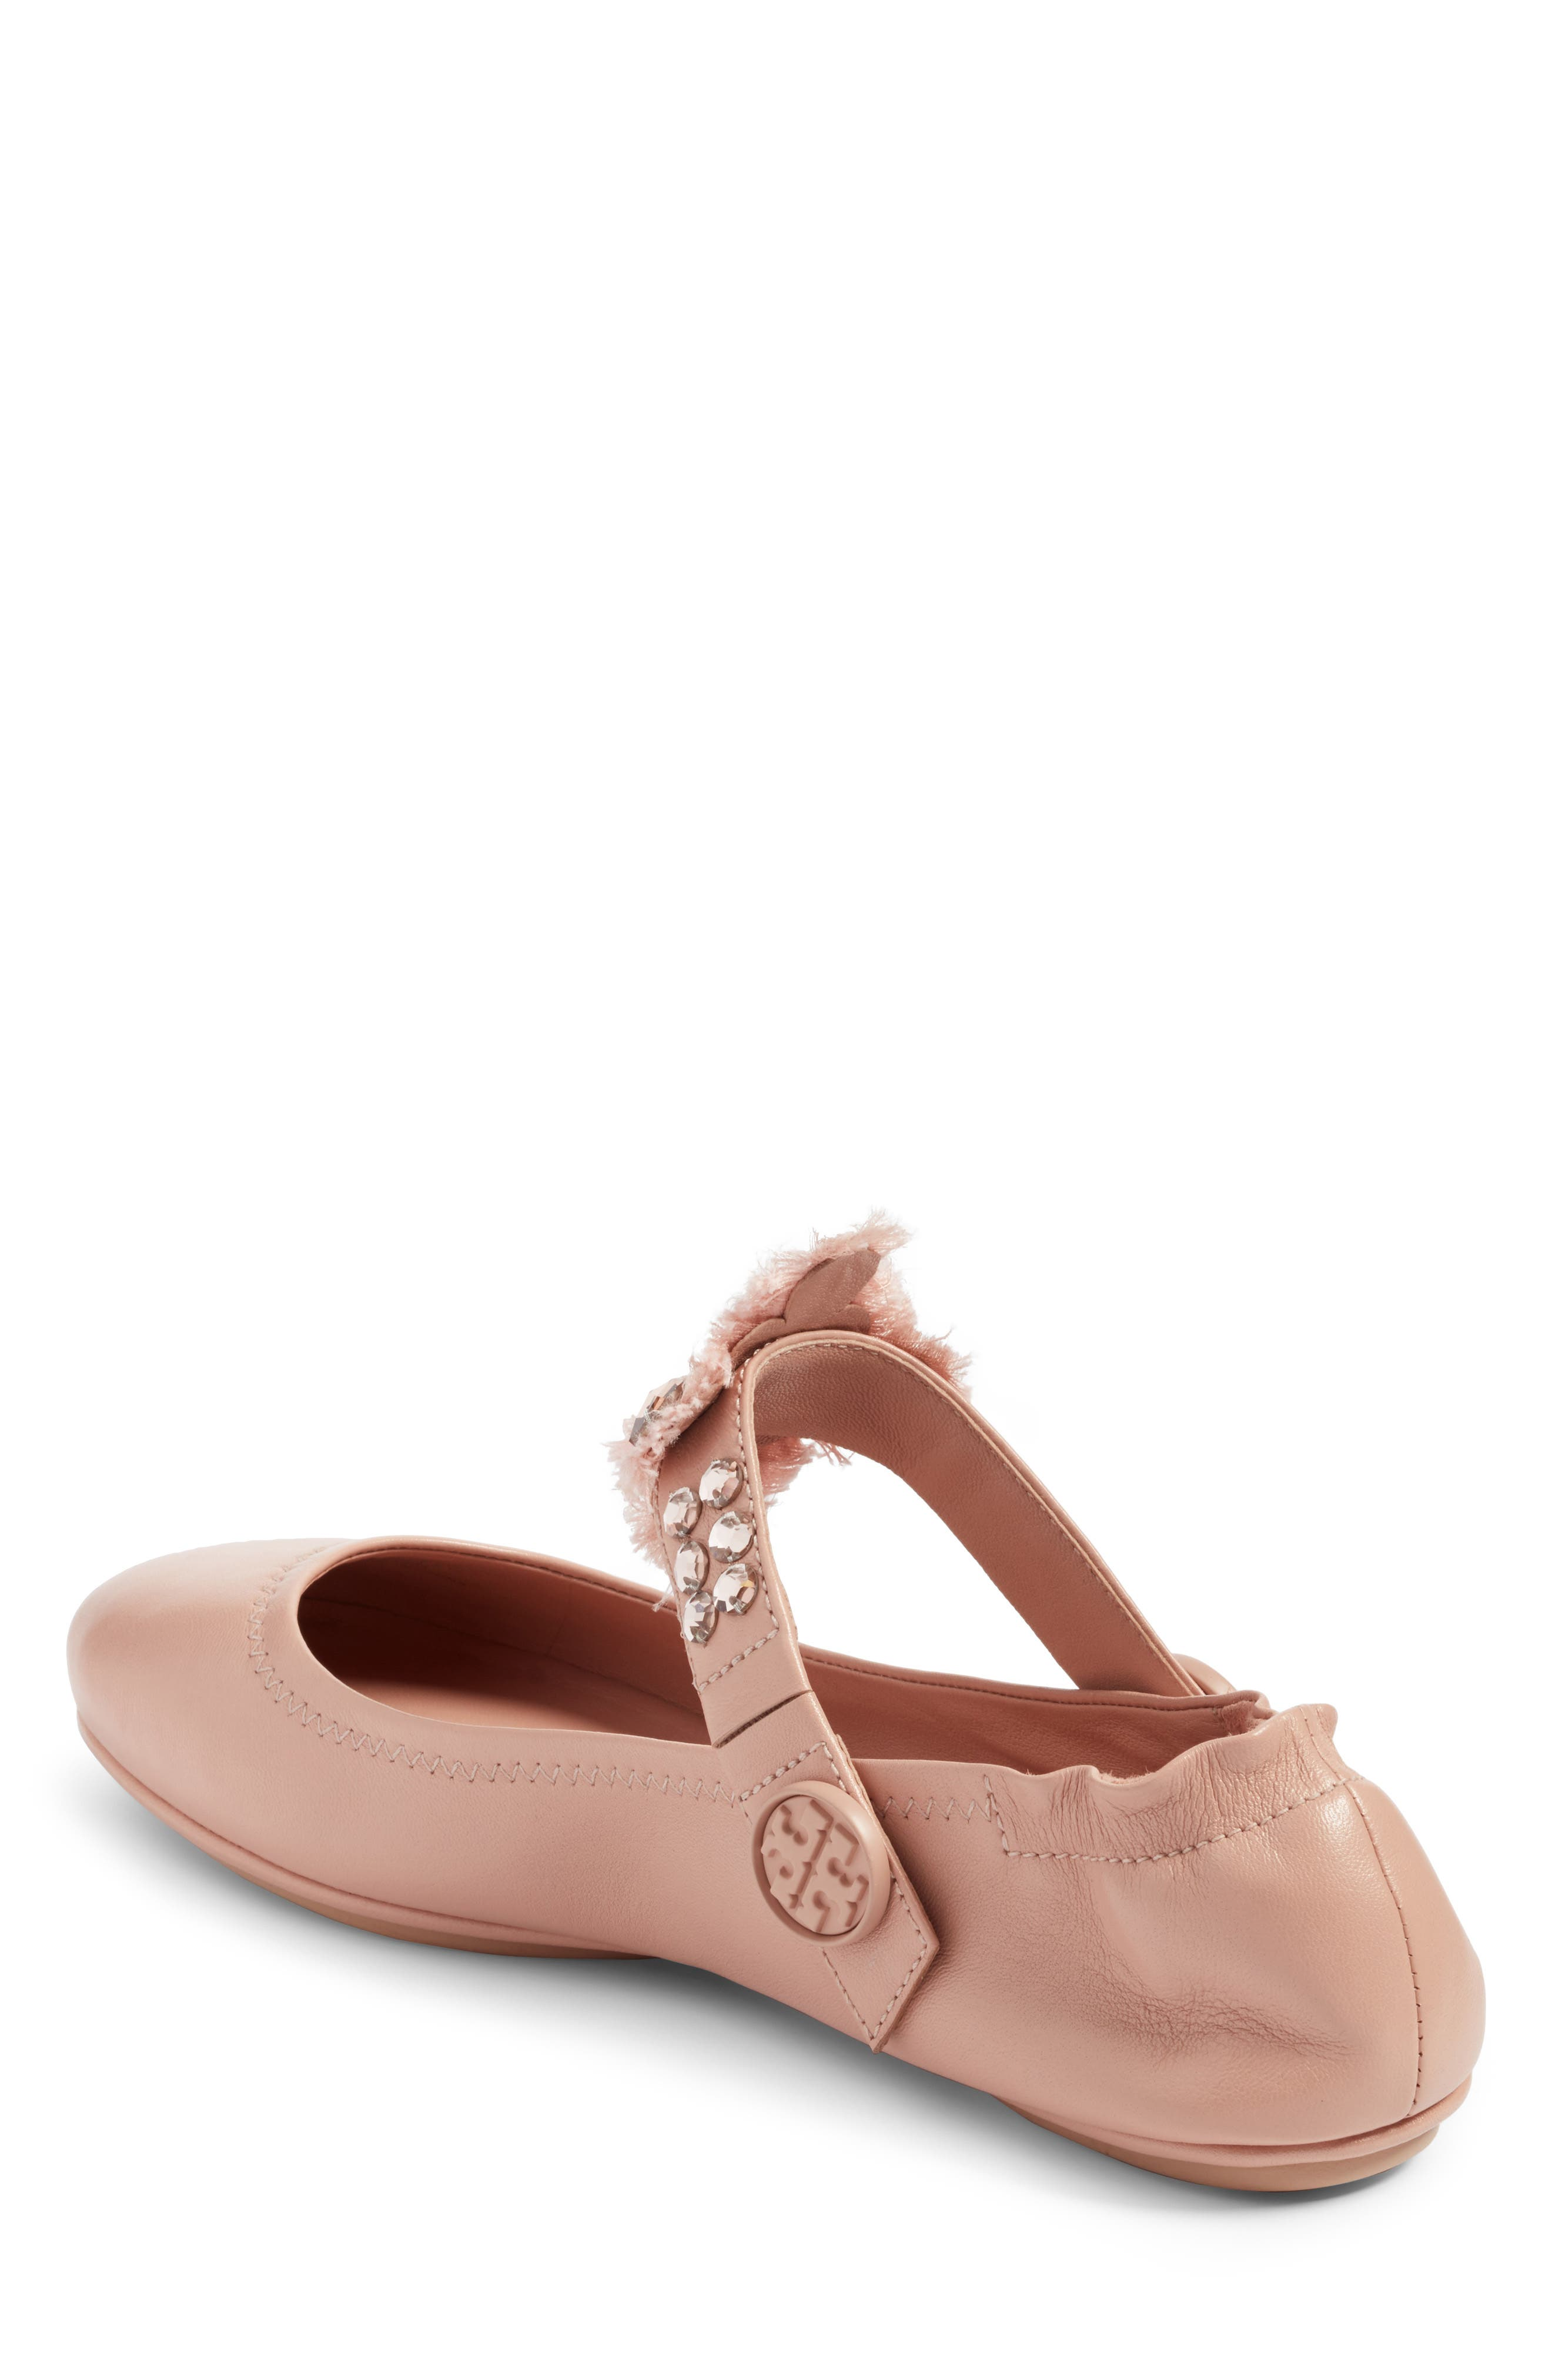 Alternate Image 2  - Tory Burch Minnie Embellished Convertible Strap Ballet Flat (Women)